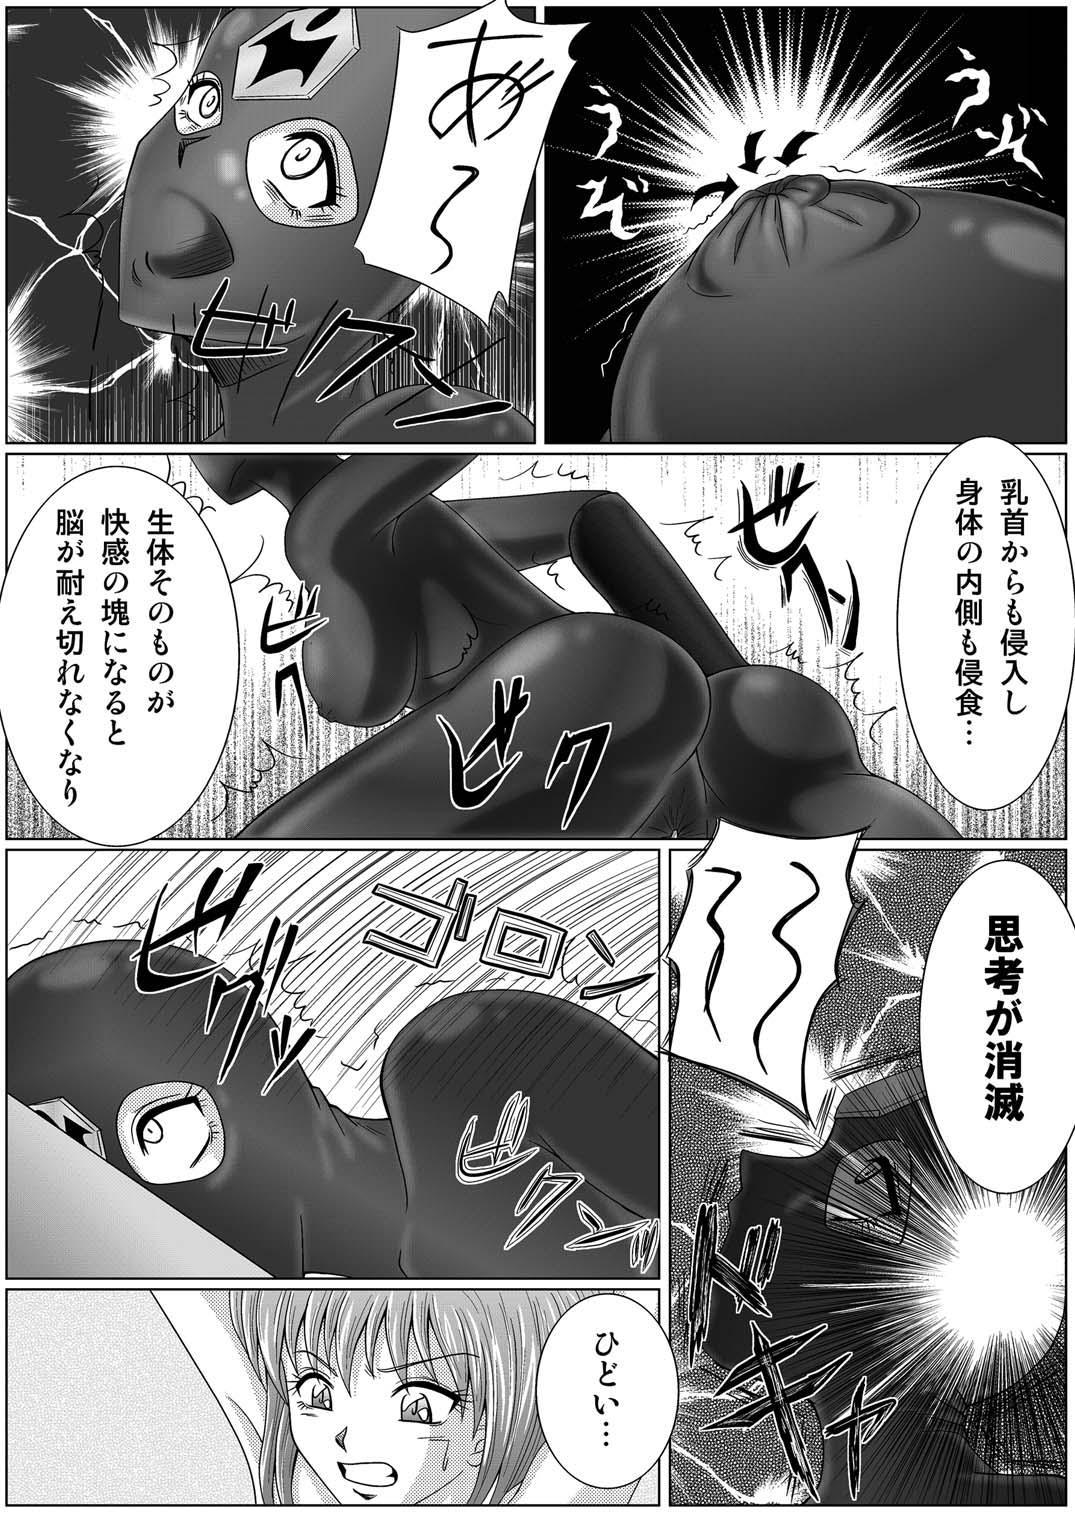 [Macxe's (monmon)] Tokubousentai Dinaranger ~Heroine Kairaku Sennou Keikaku~ Vol.01/02/03 (Renkaban) [Digital] 27